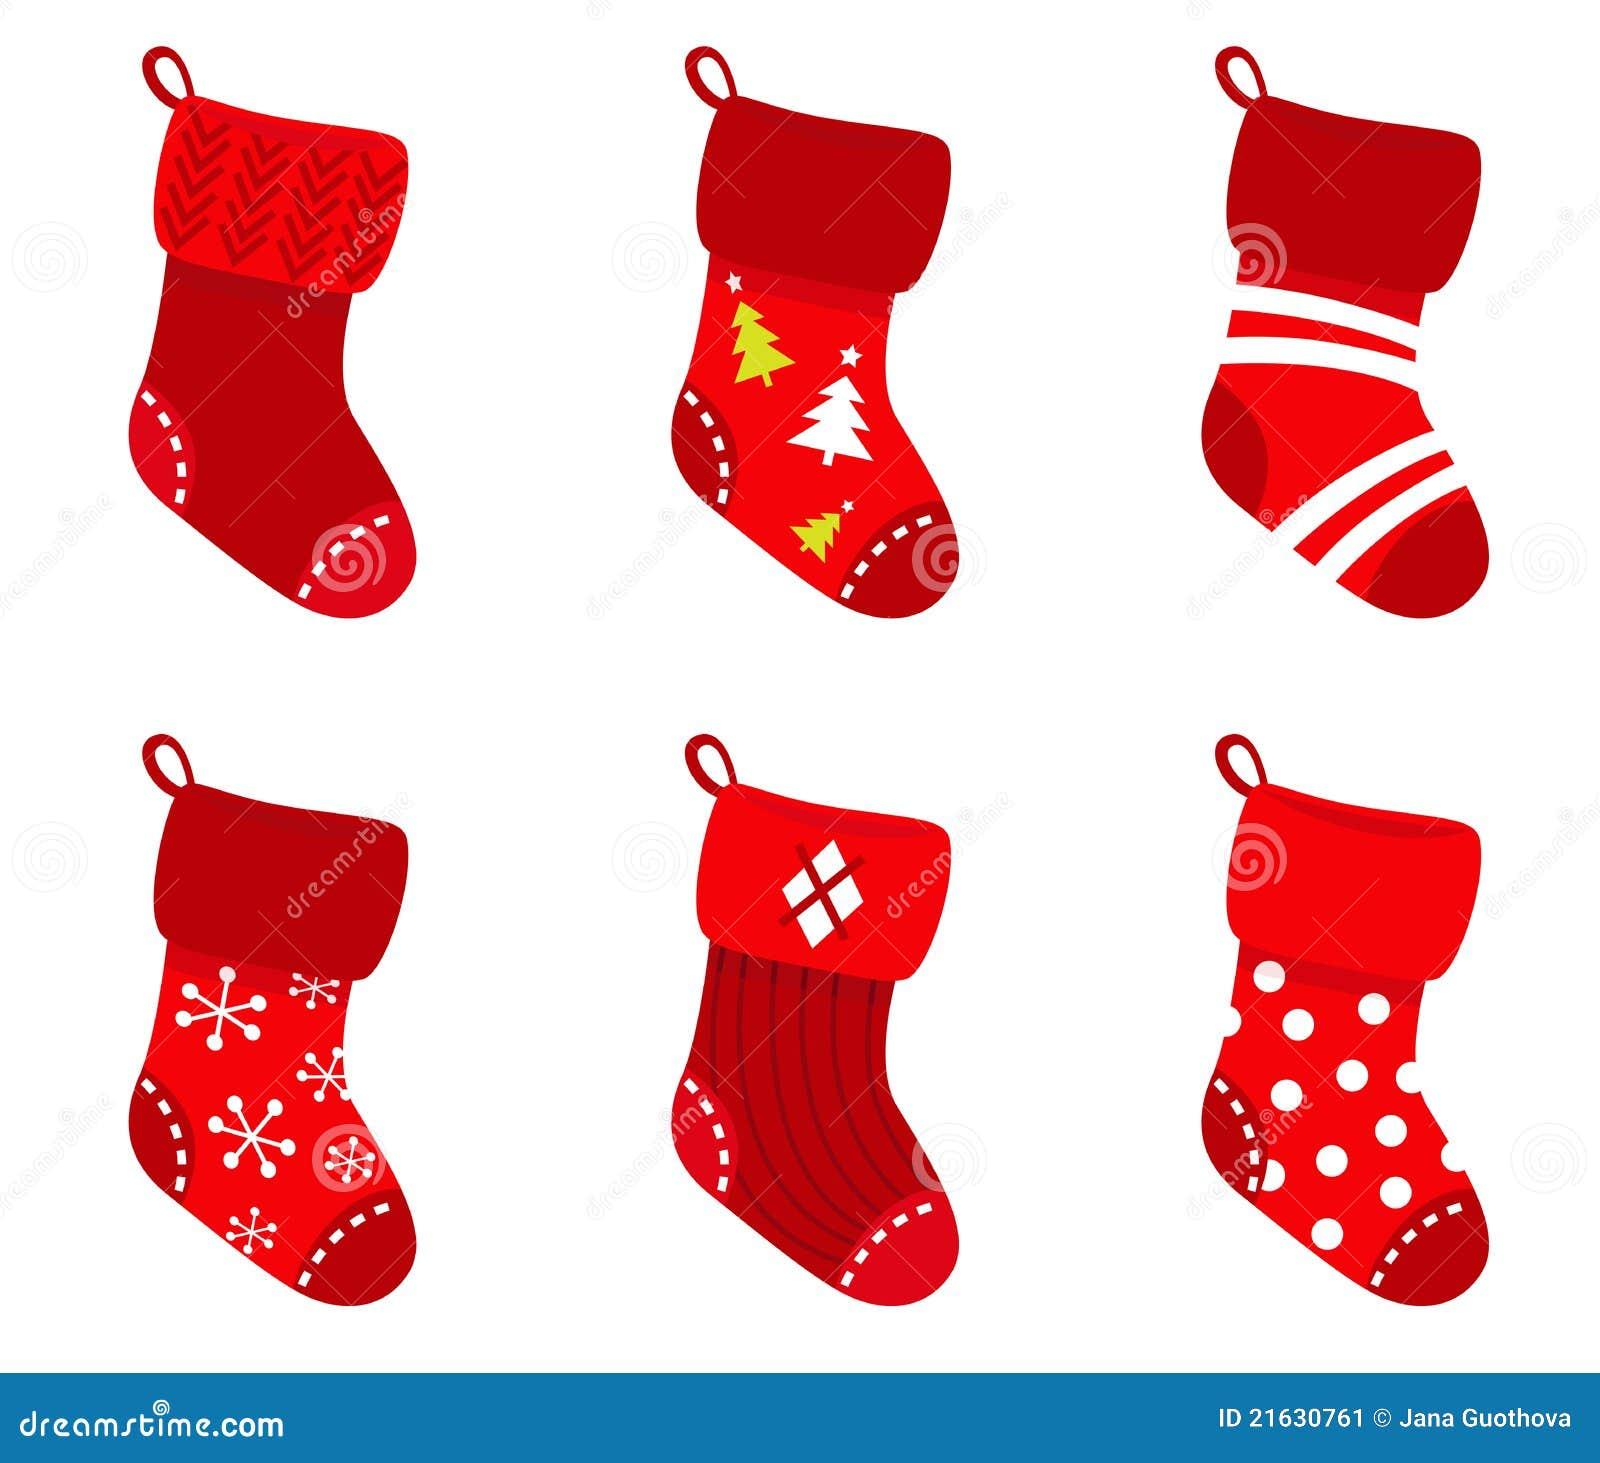 Red Retro Christmas Socks Collection. Stock Image - Image: 21630761